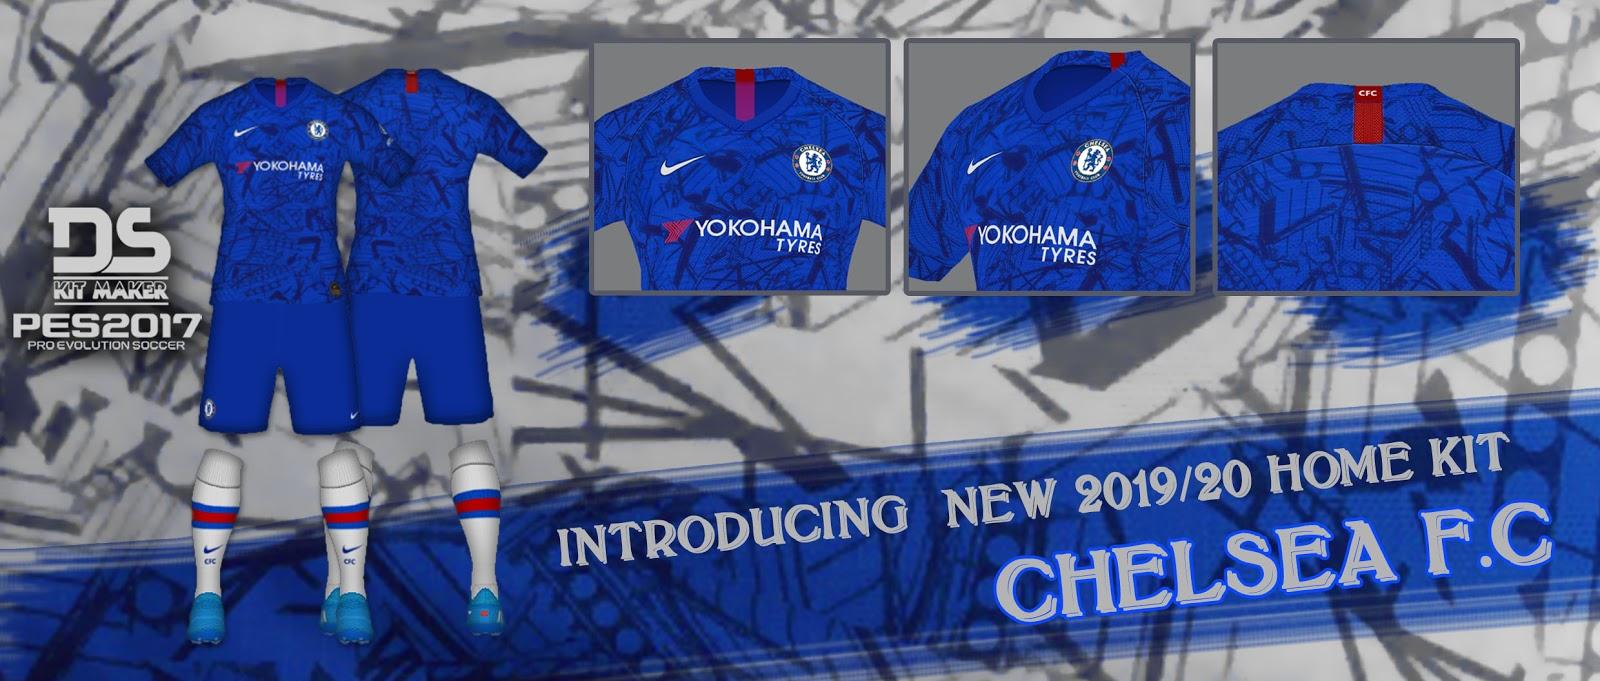 1d6cbf9d Chelsea Kit | Season 2019-20 | PES2017 | PC | Pes Free Downloads